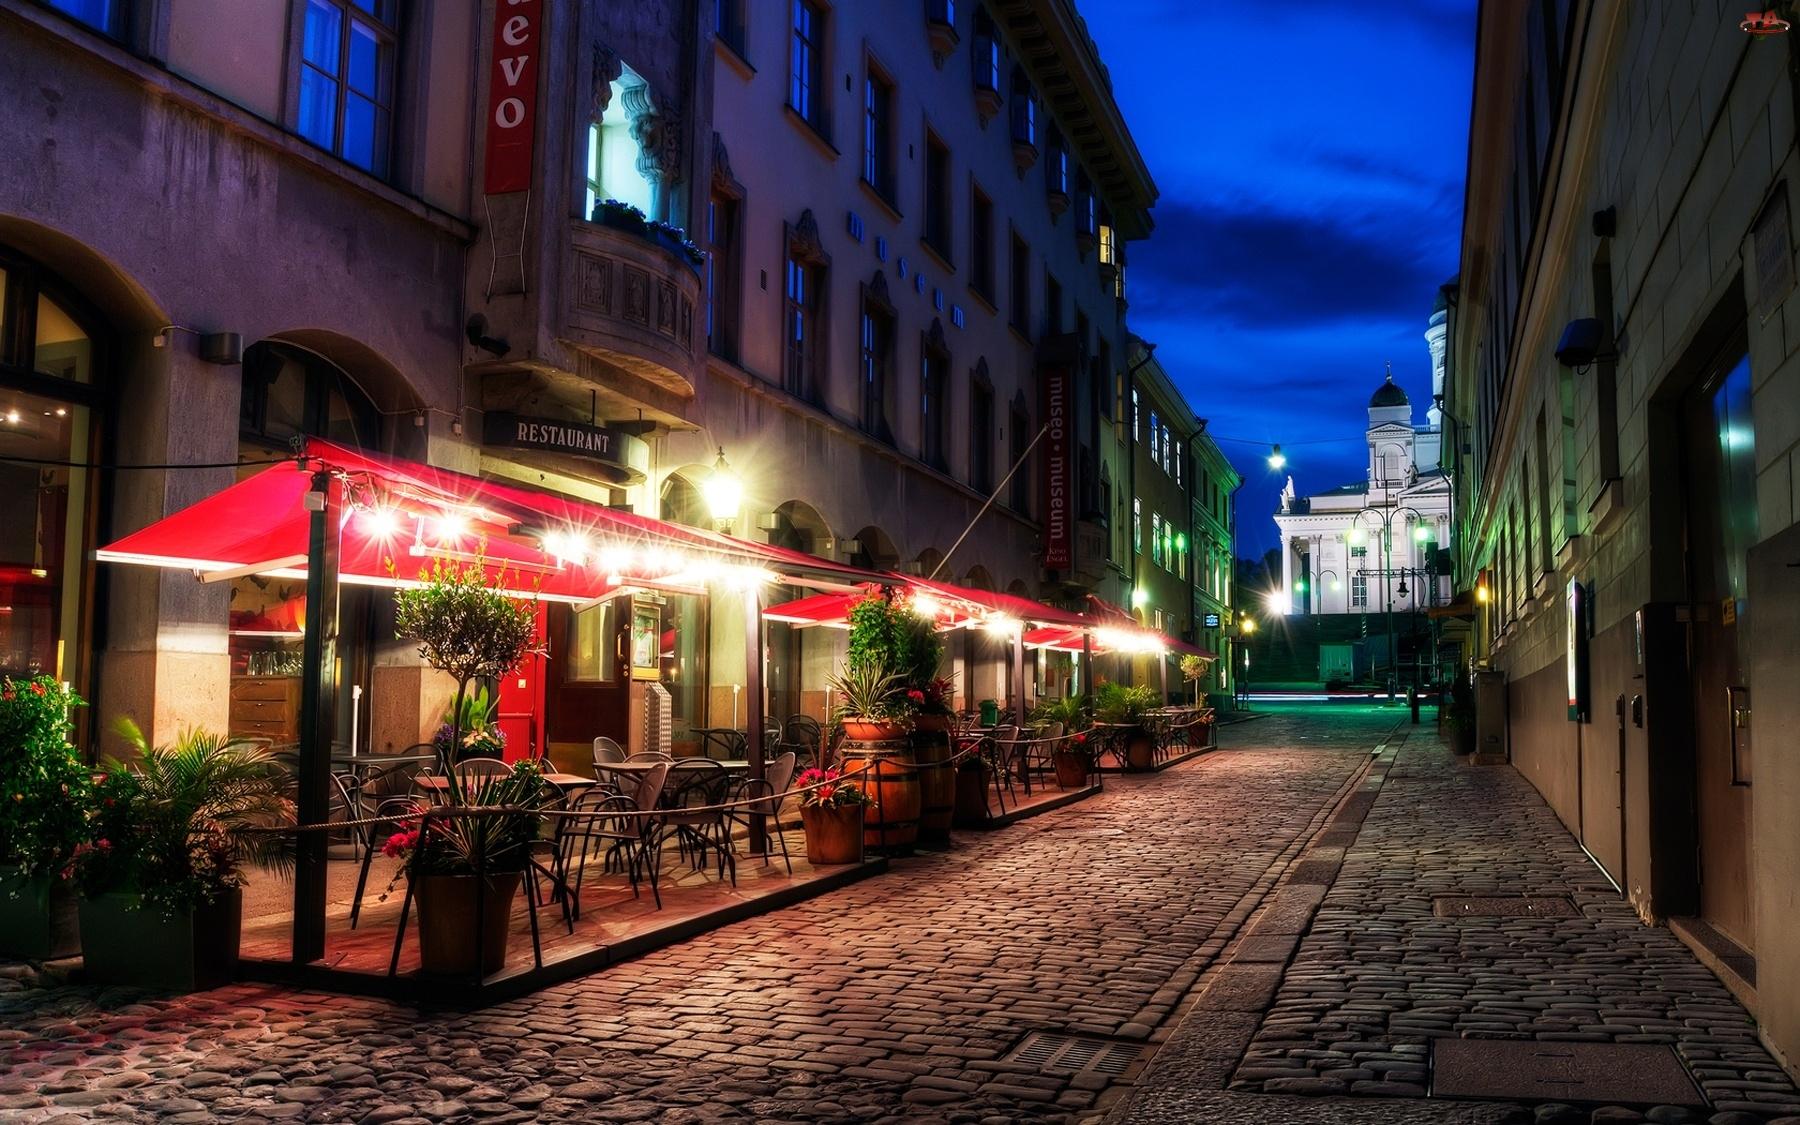 Helsinki, Ulica, Restauracja, Brukowana